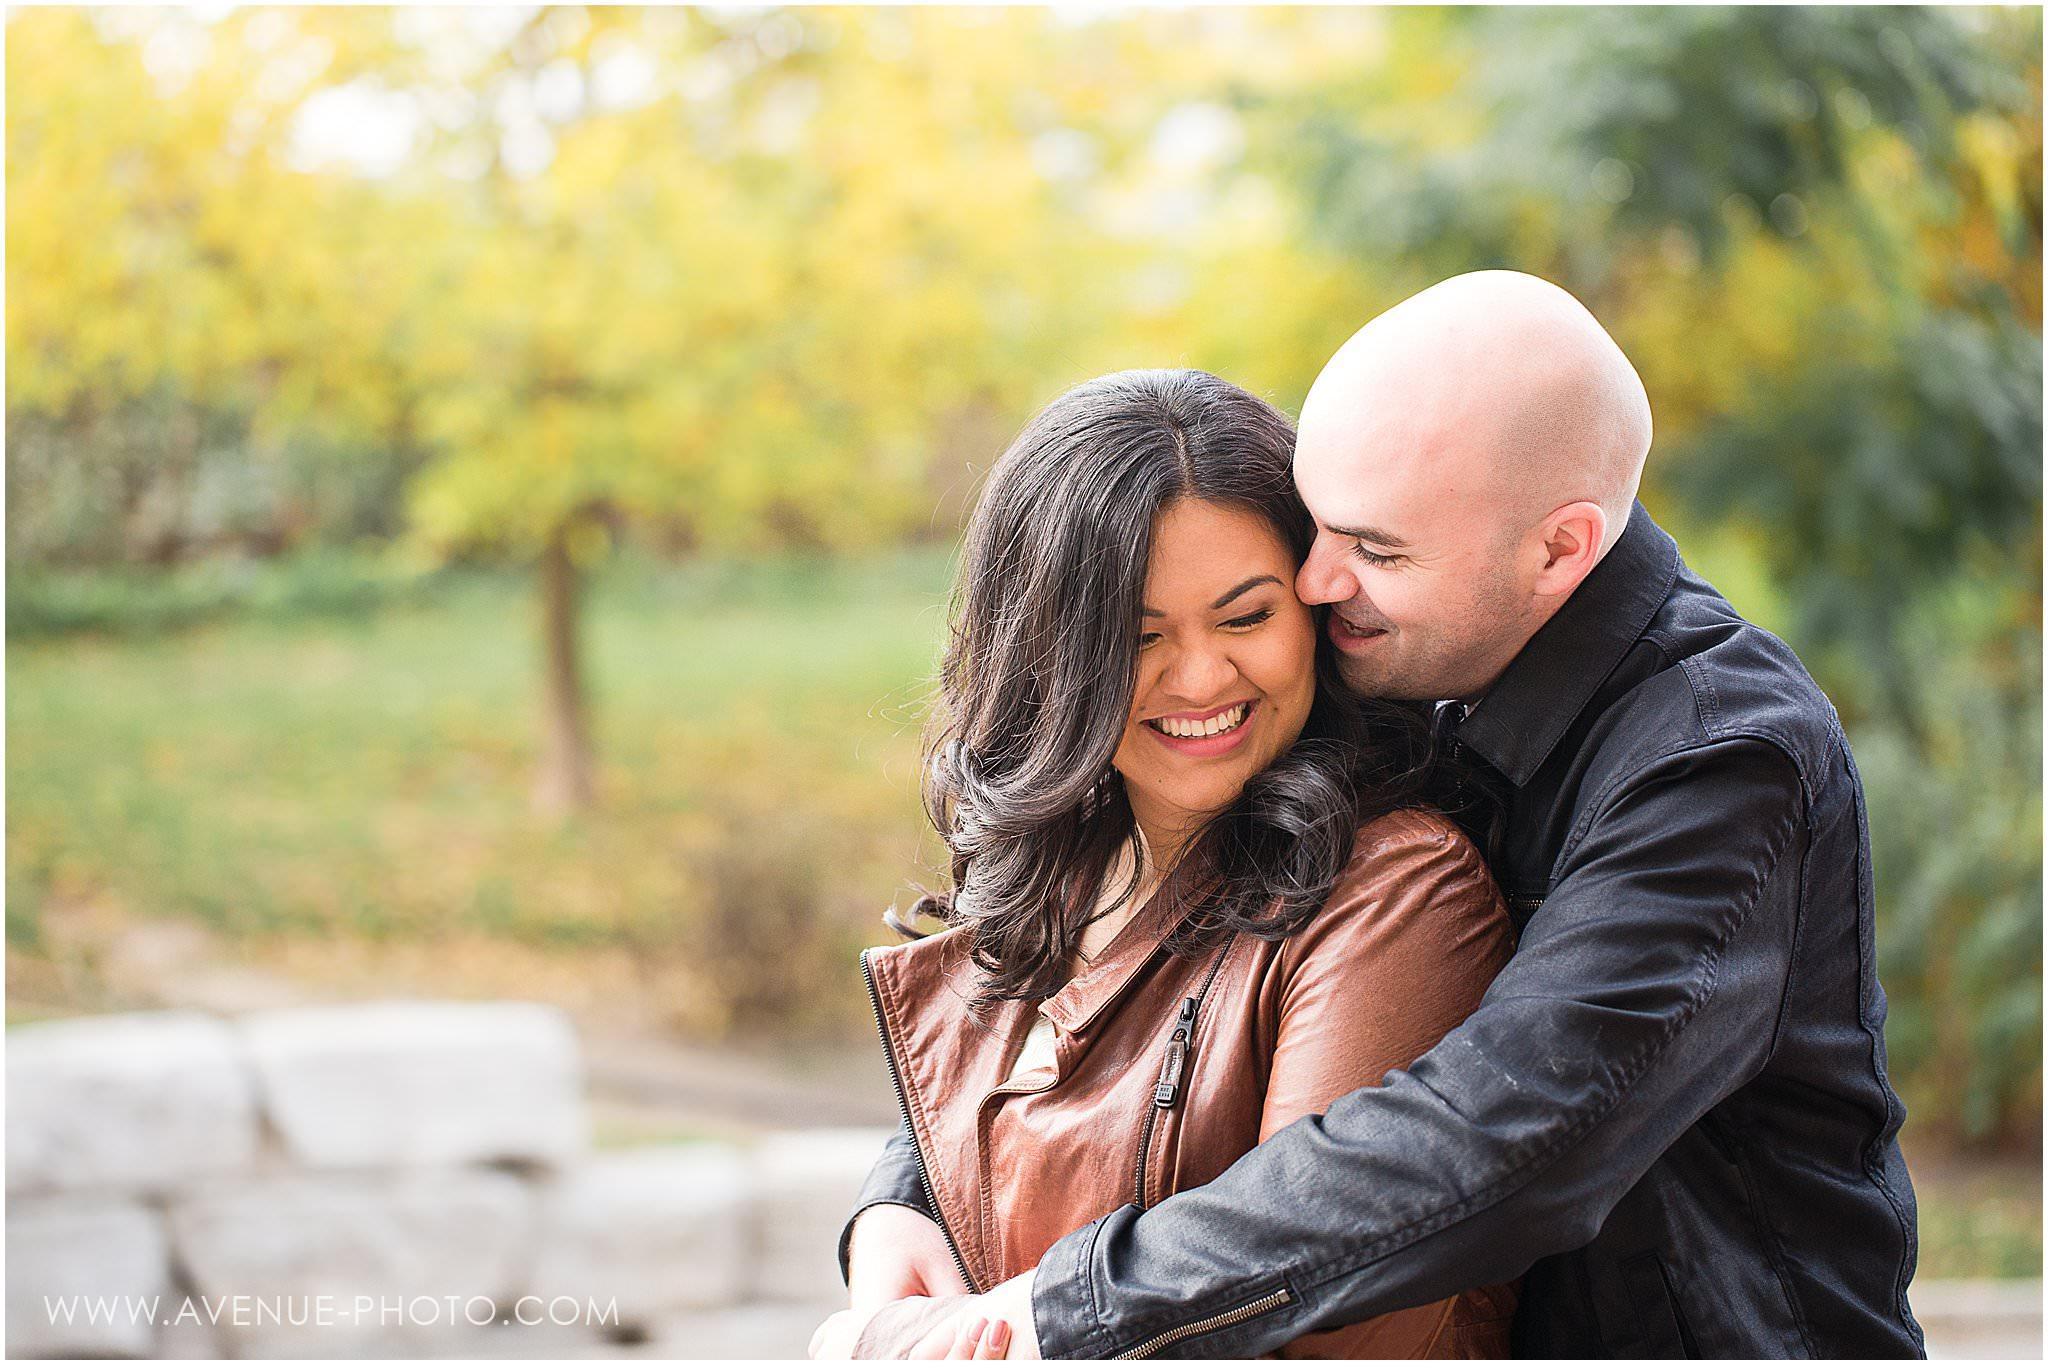 Cluny Bistro Distillery District Engagement Photos, Distillery District Wedding, Cluny Bistro Wedding, Toronto Wedding Photographer